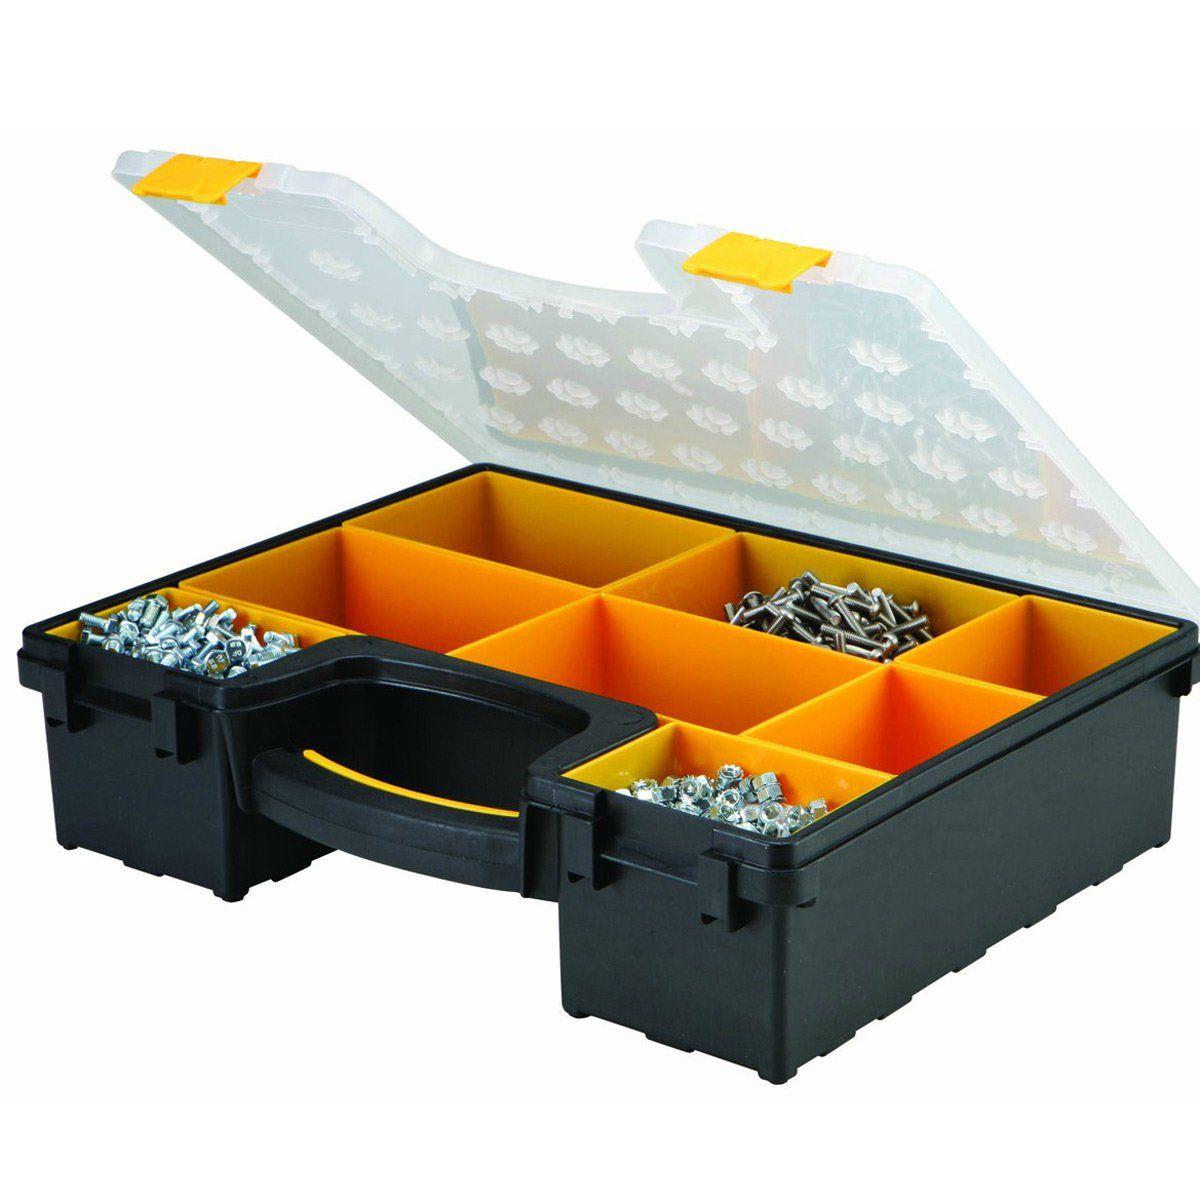 24+ Portable craft storage box ideas in 2021